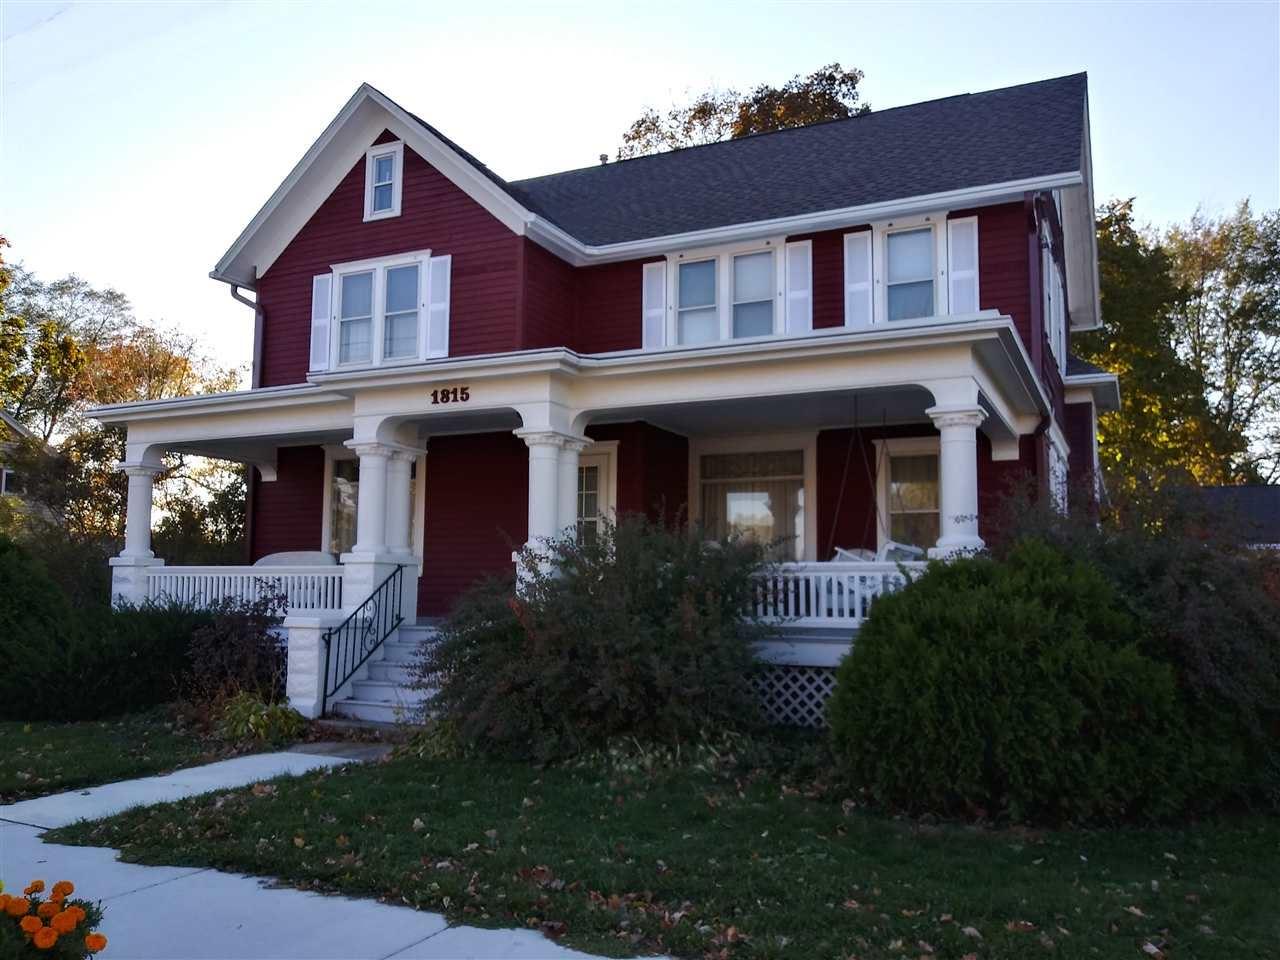 1815 S ONEIDA Street, Appleton, WI 54915 - MLS#: 50232530